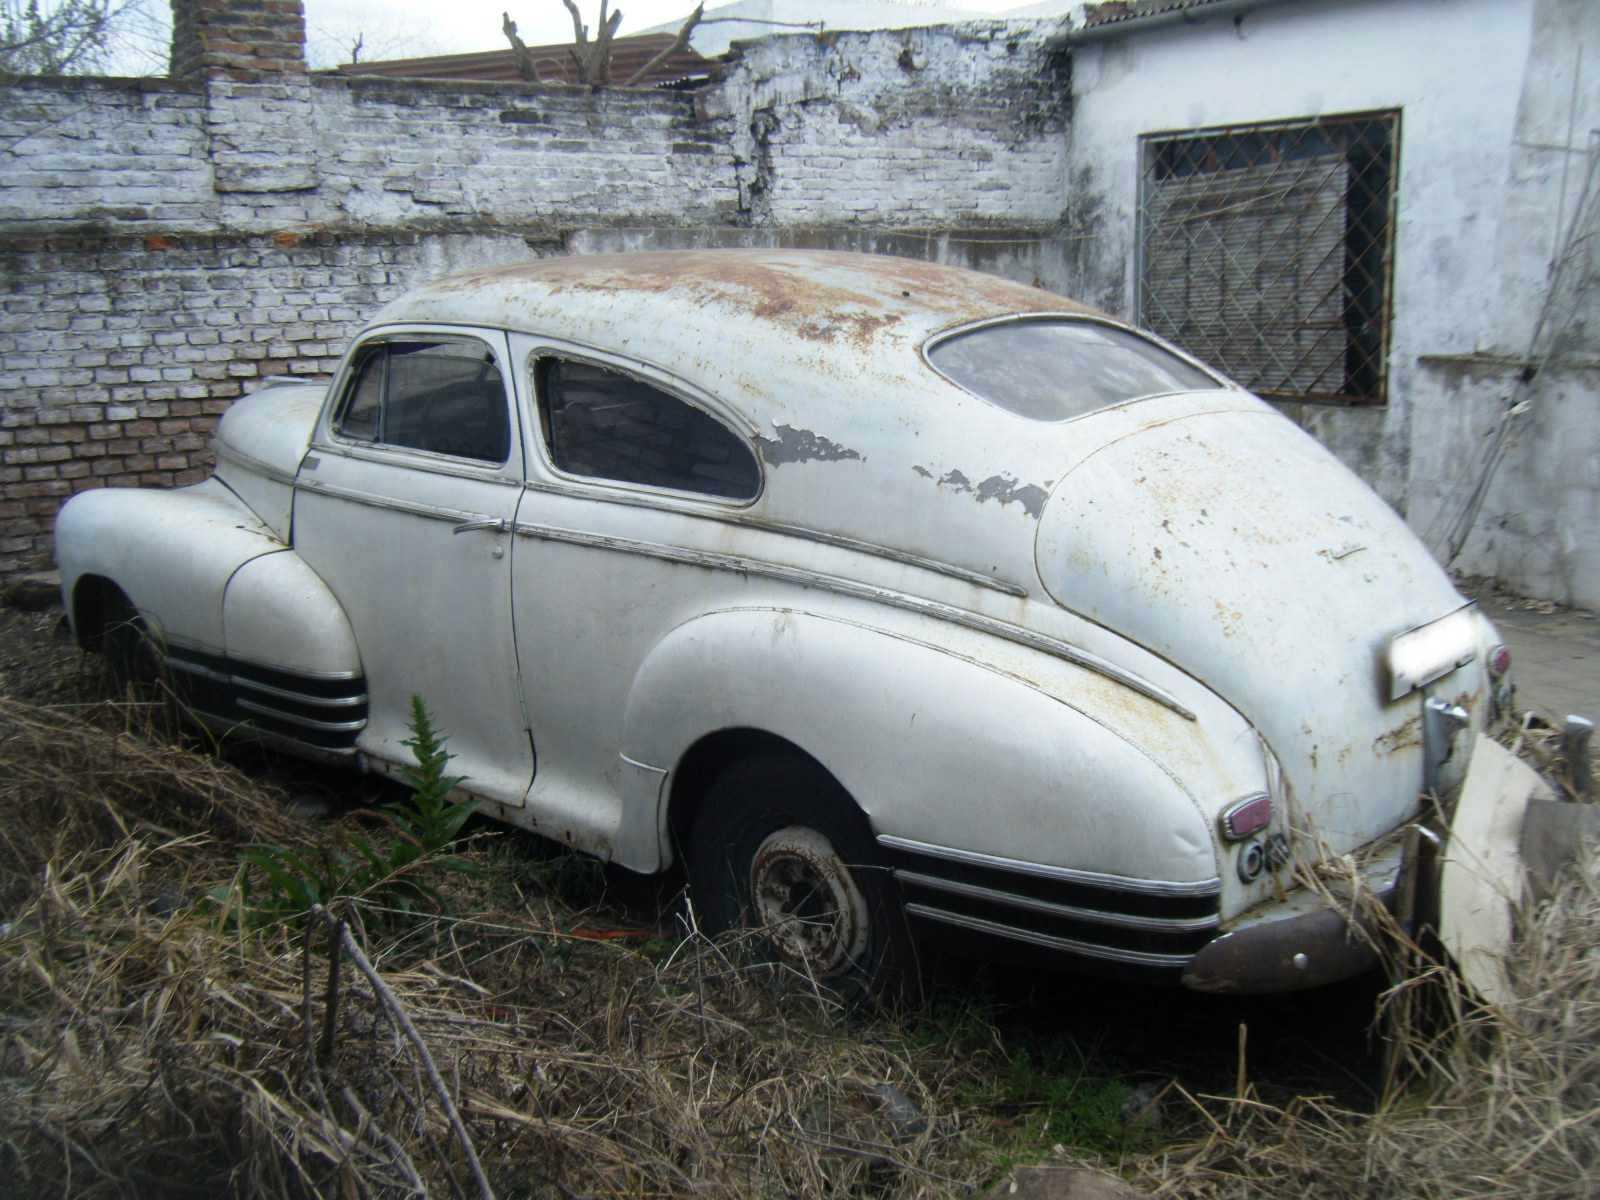 pablo-chevrolet-feetline-1946-2 Chevrolet Fleetline (1946)